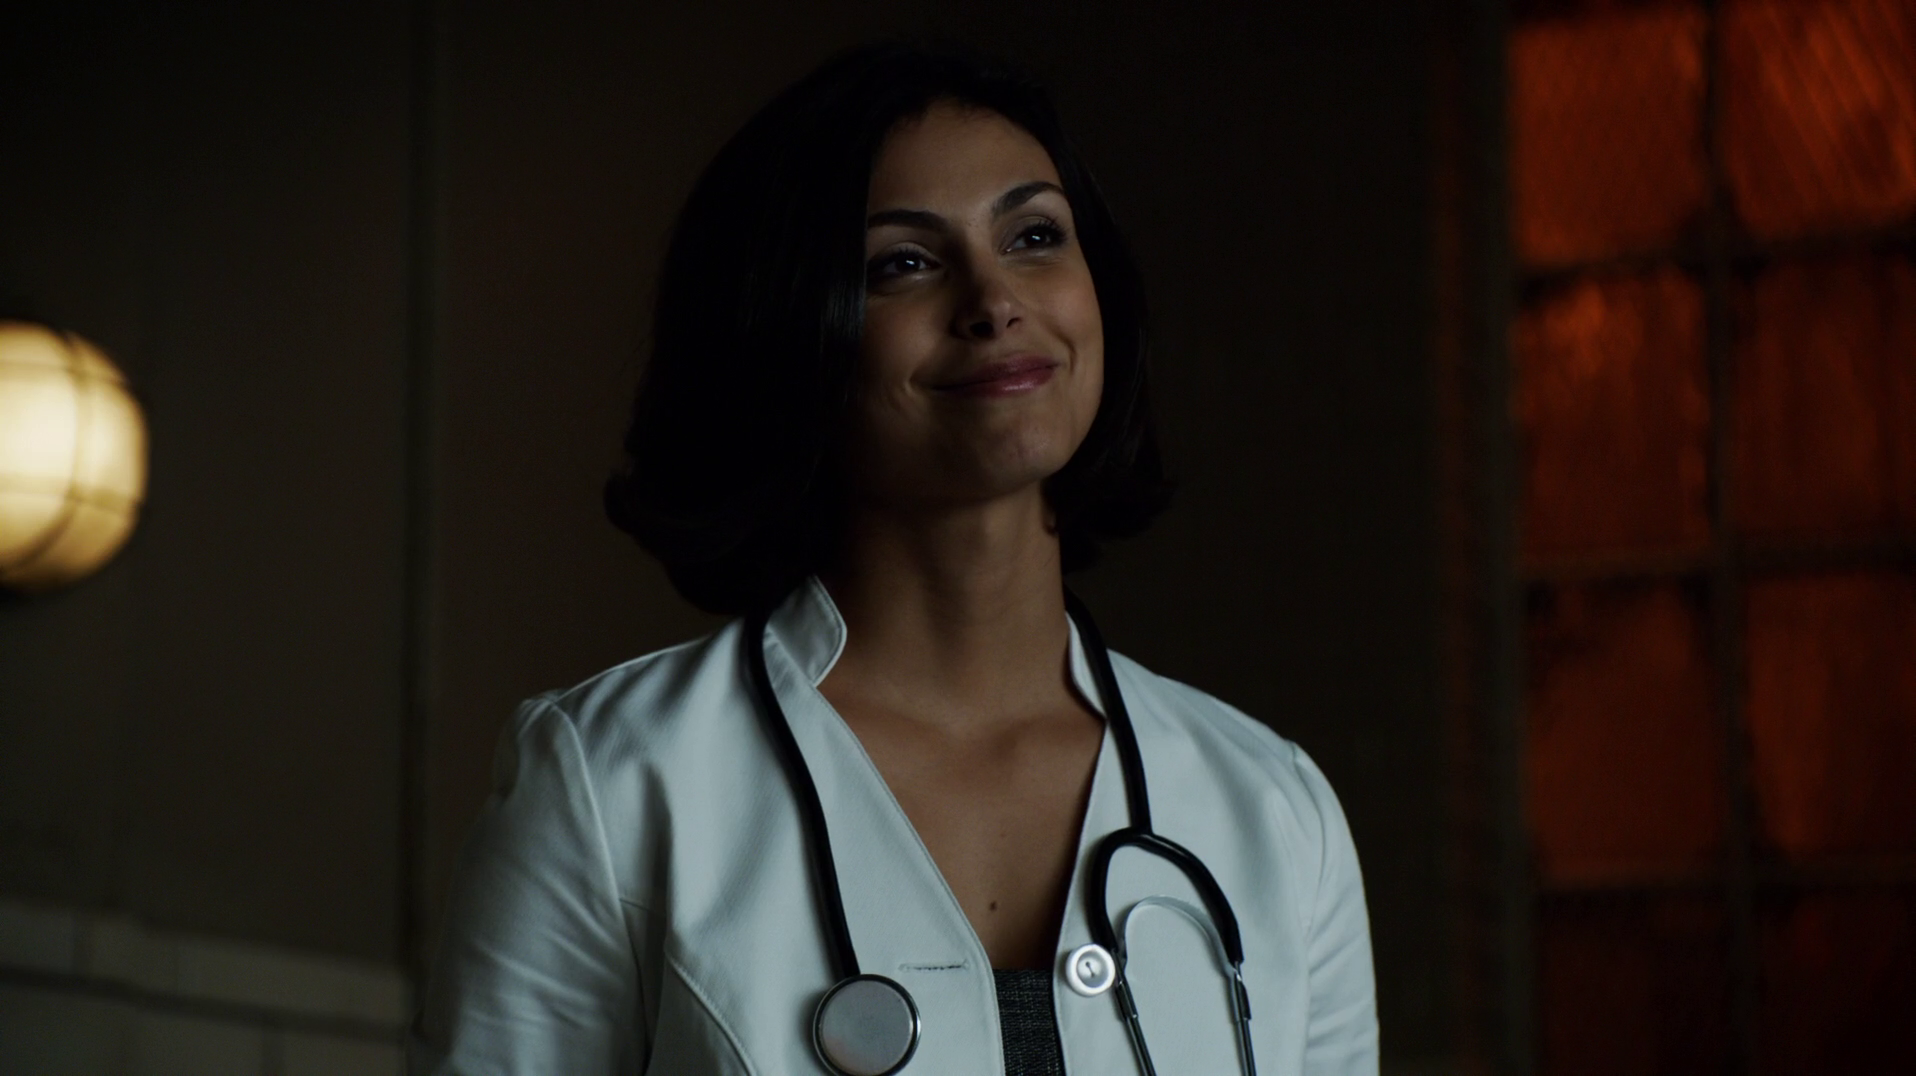 Leslie Thompkins (Gotham)